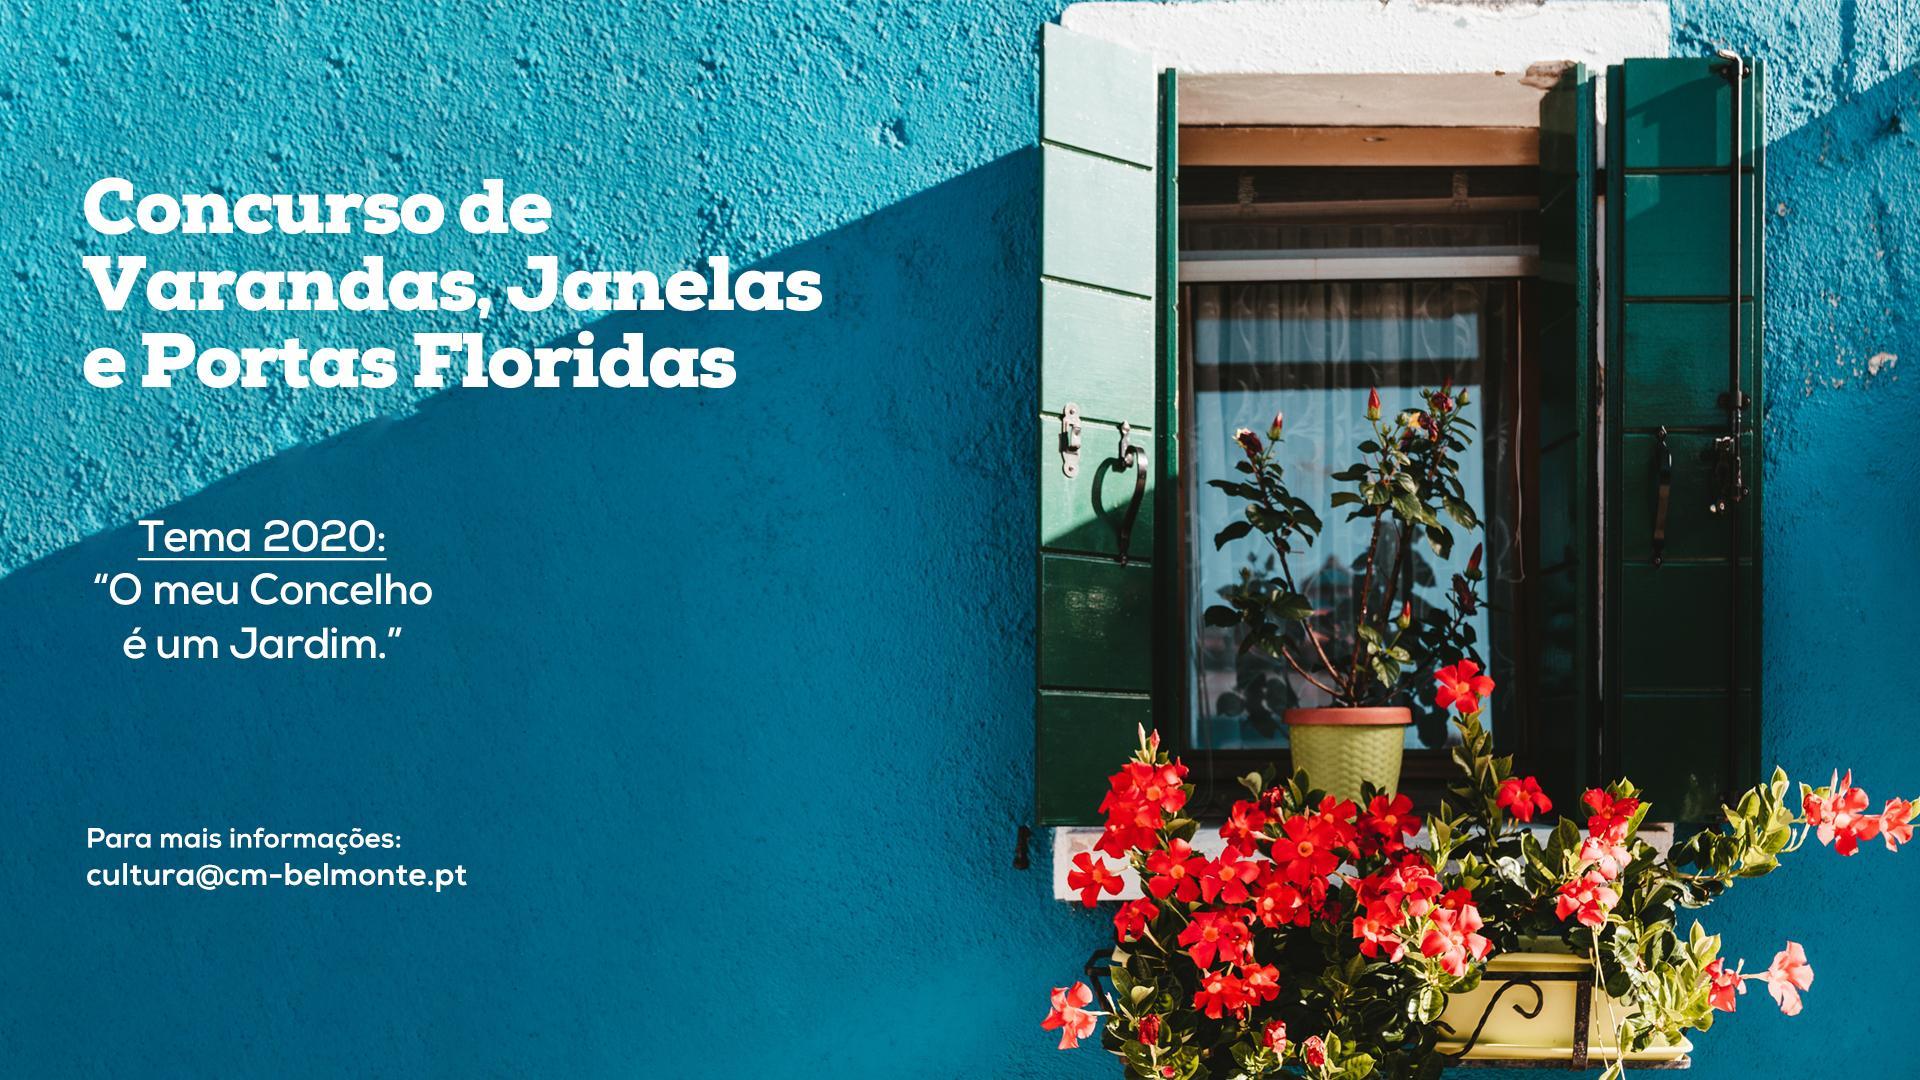 Concurso Portas, Janelas, Varandas Florida 2020